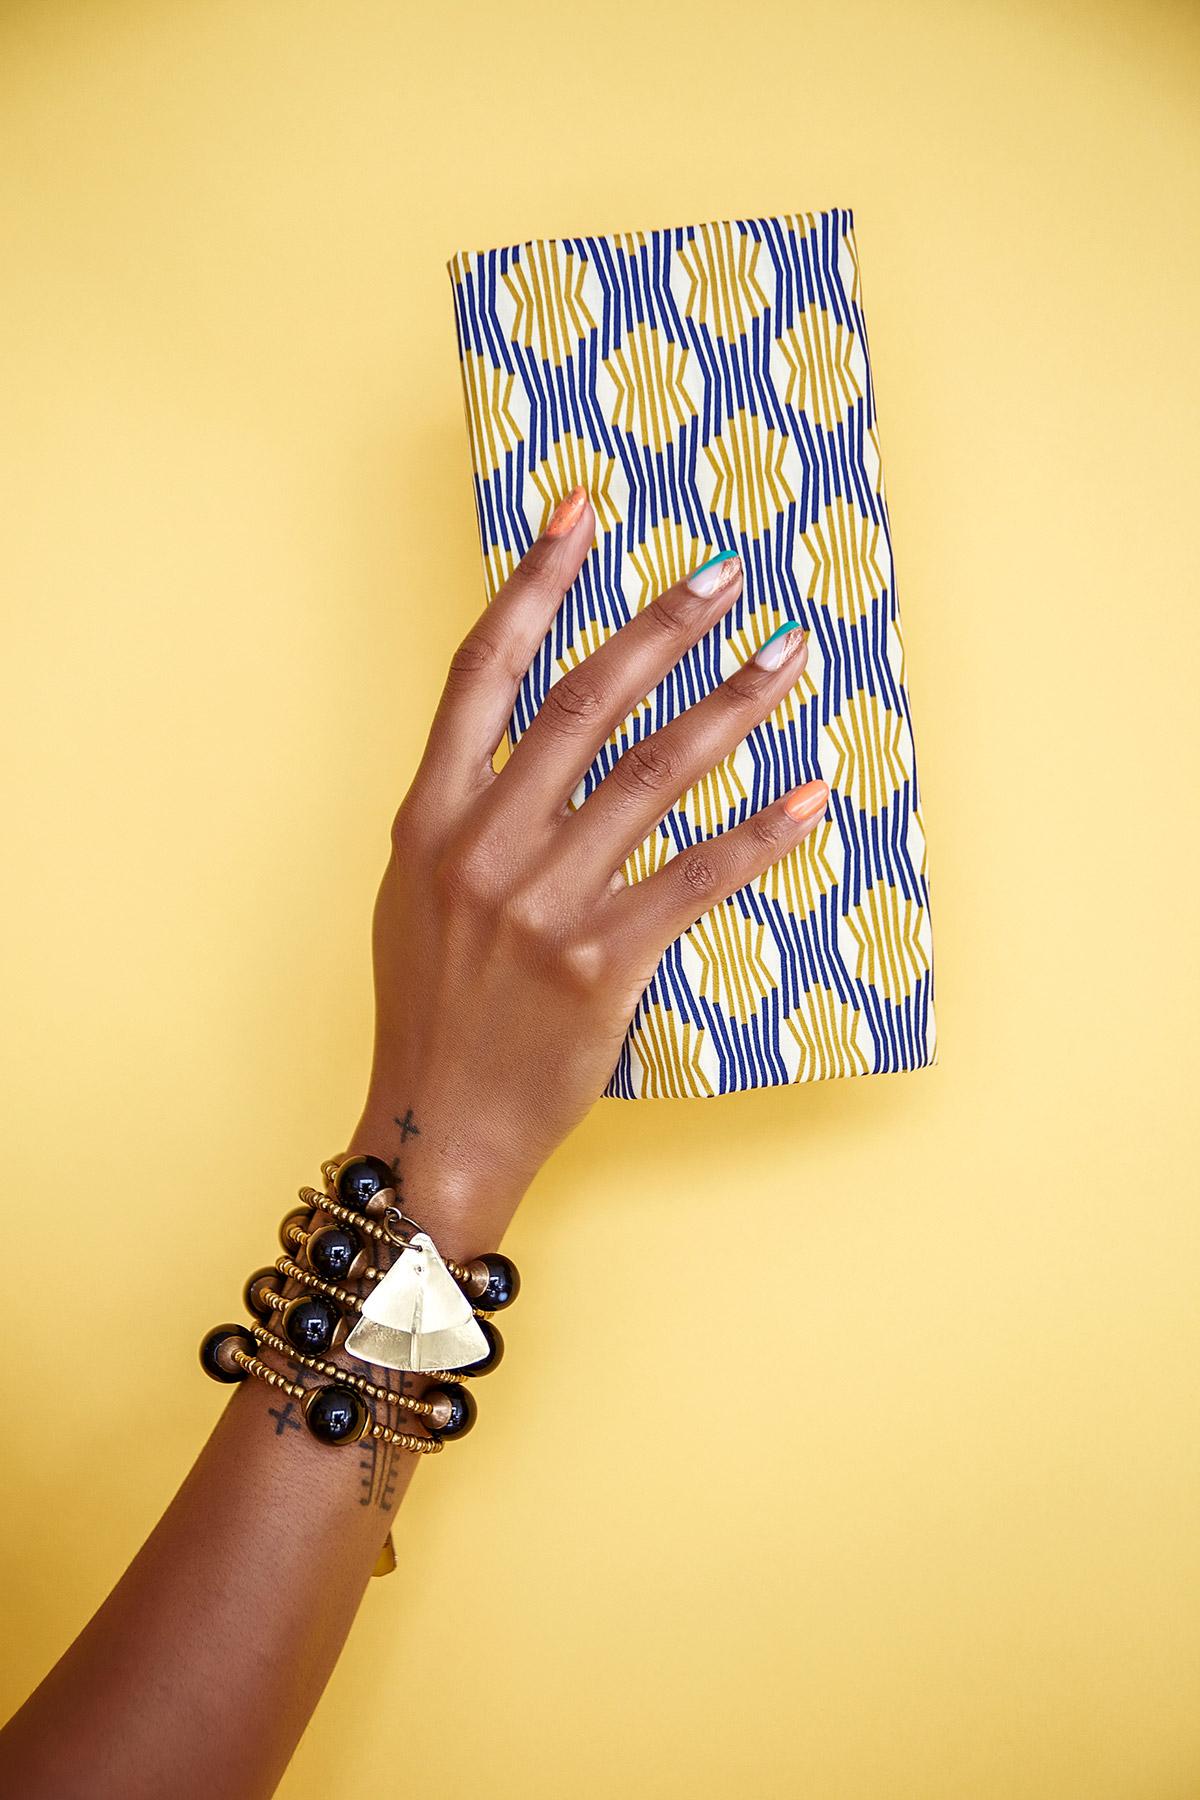 mirza-babic-fashion-photography-new-york-ny-nikon-high-fashion-product3.jpg